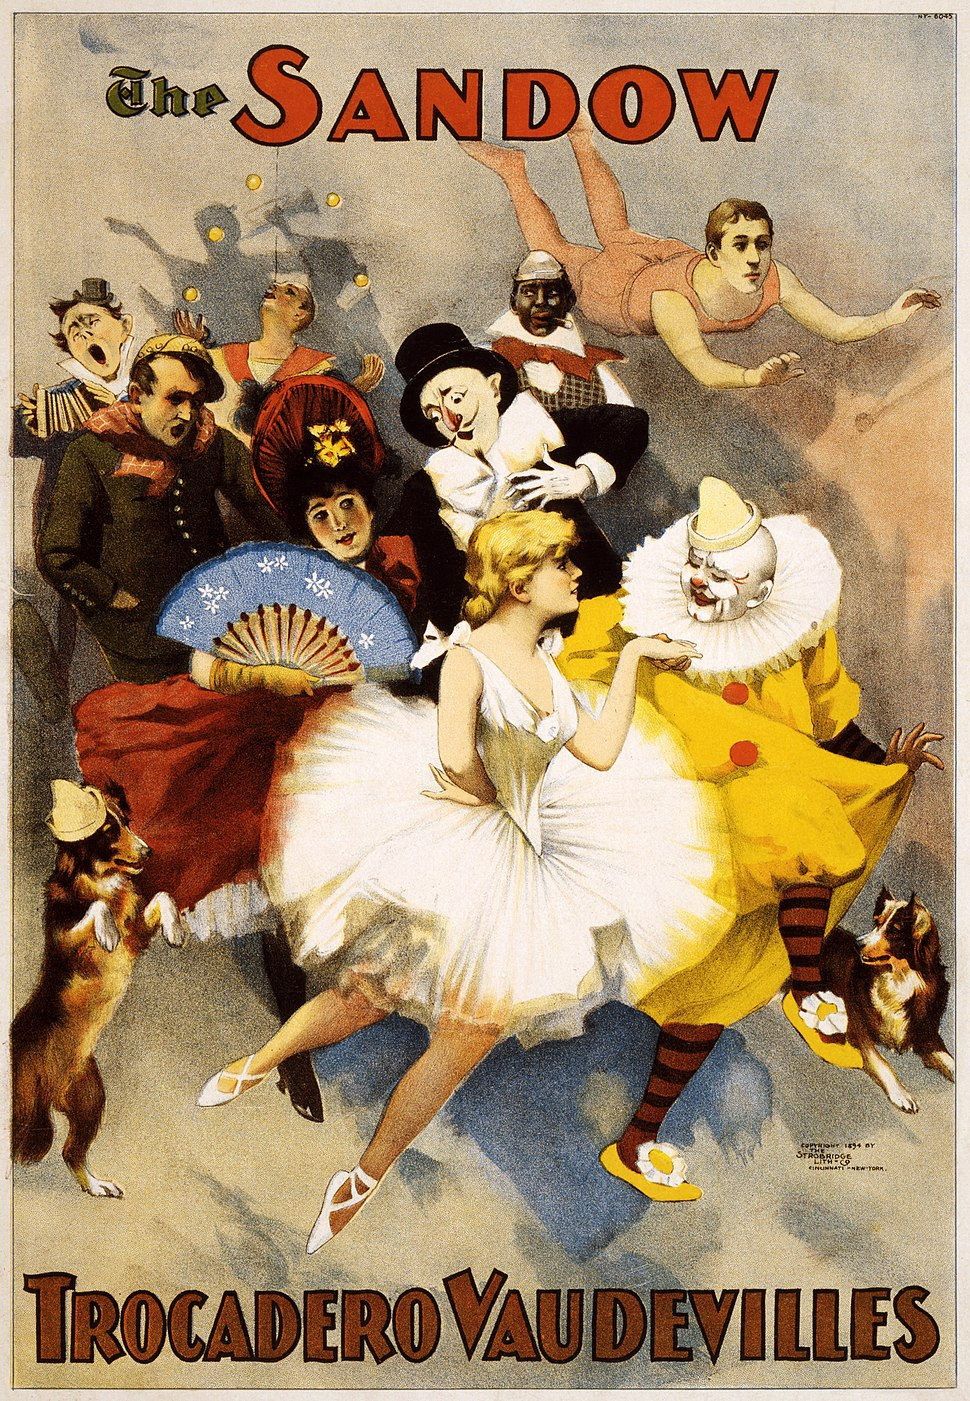 The Sandow Trocadero Vaudevilles, performing arts poster, 1894